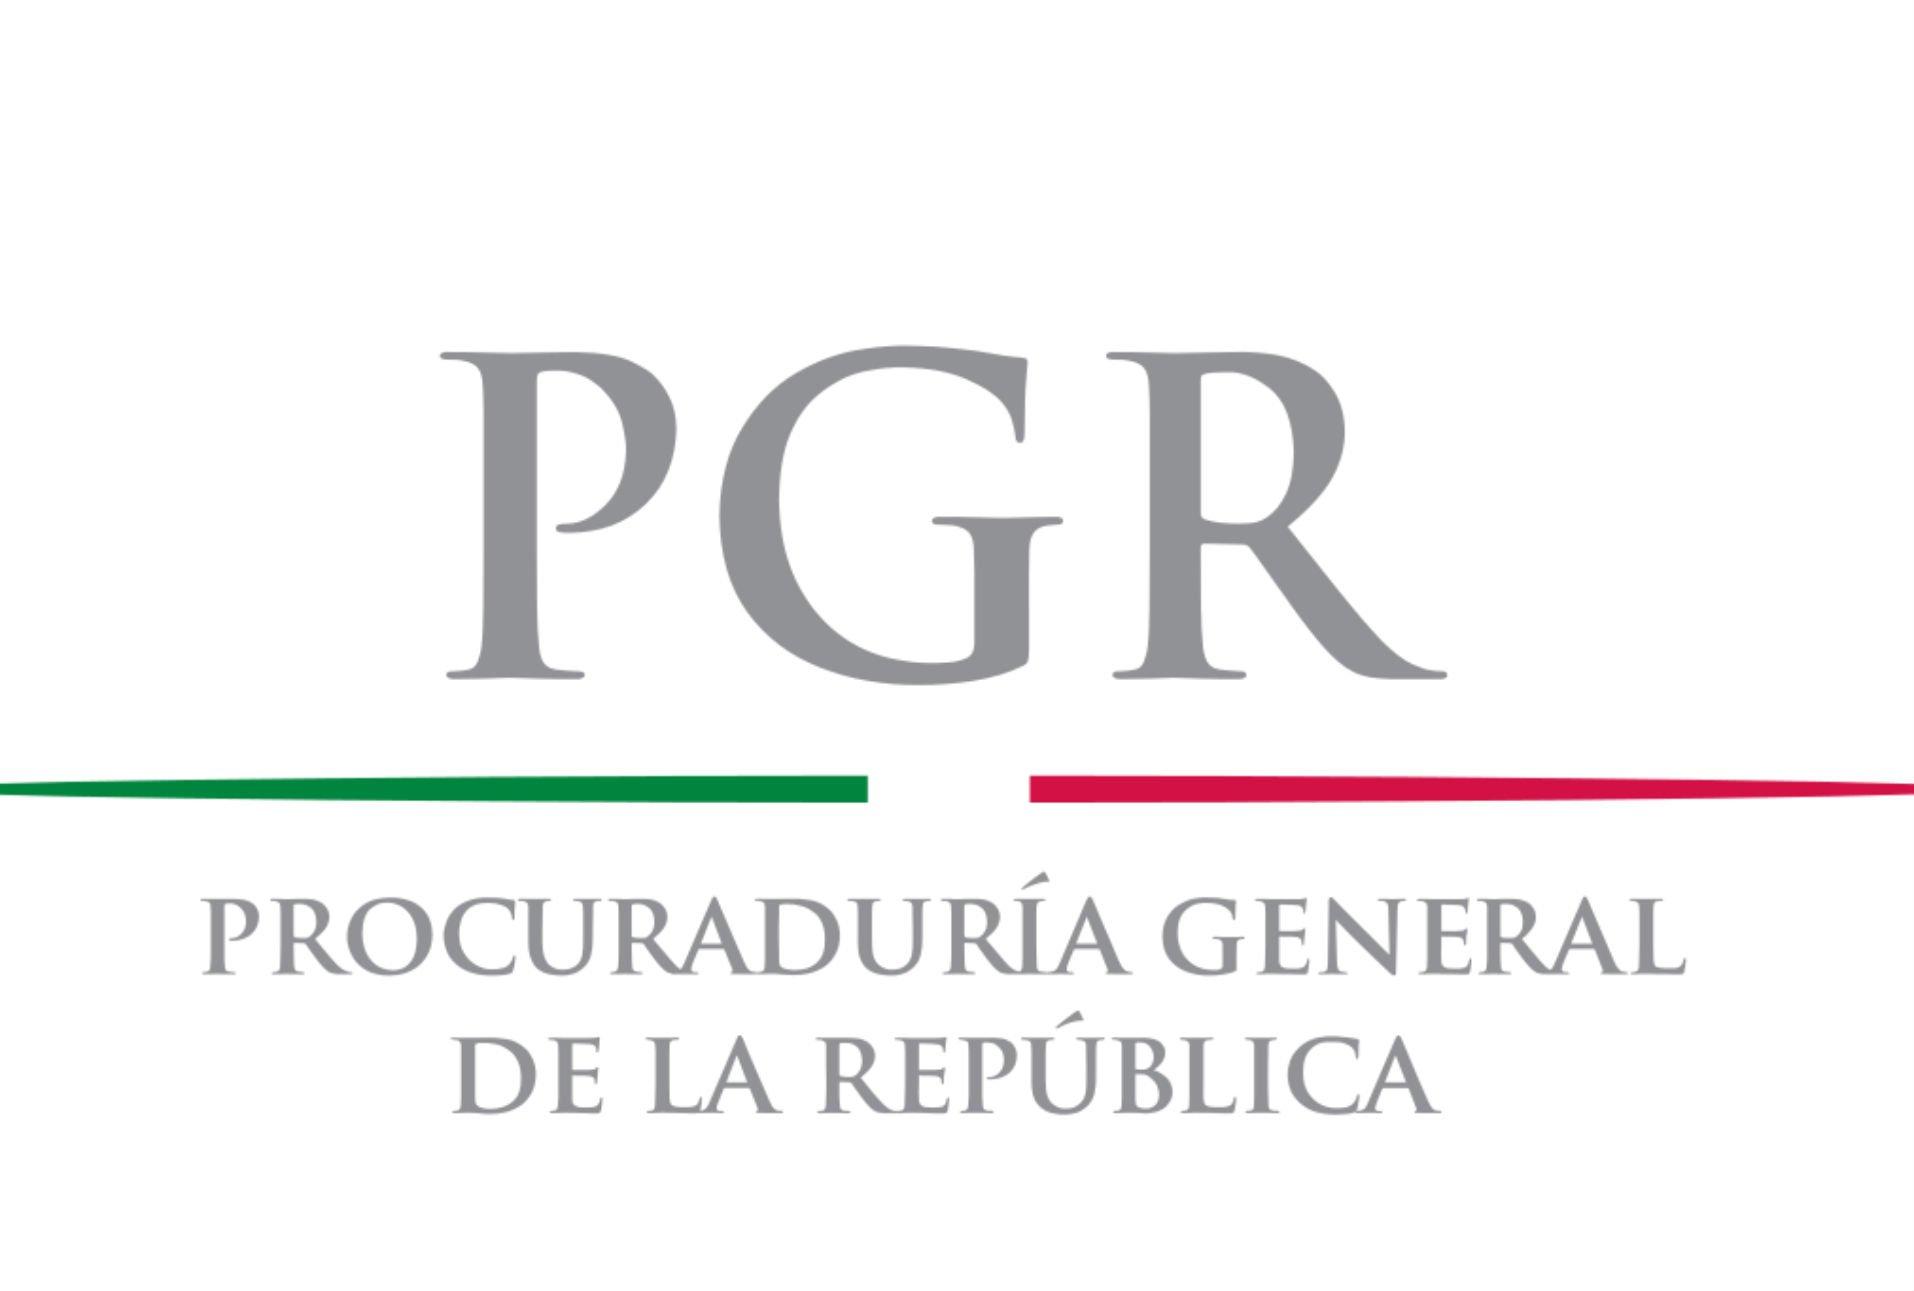 Procuraduria General de la República